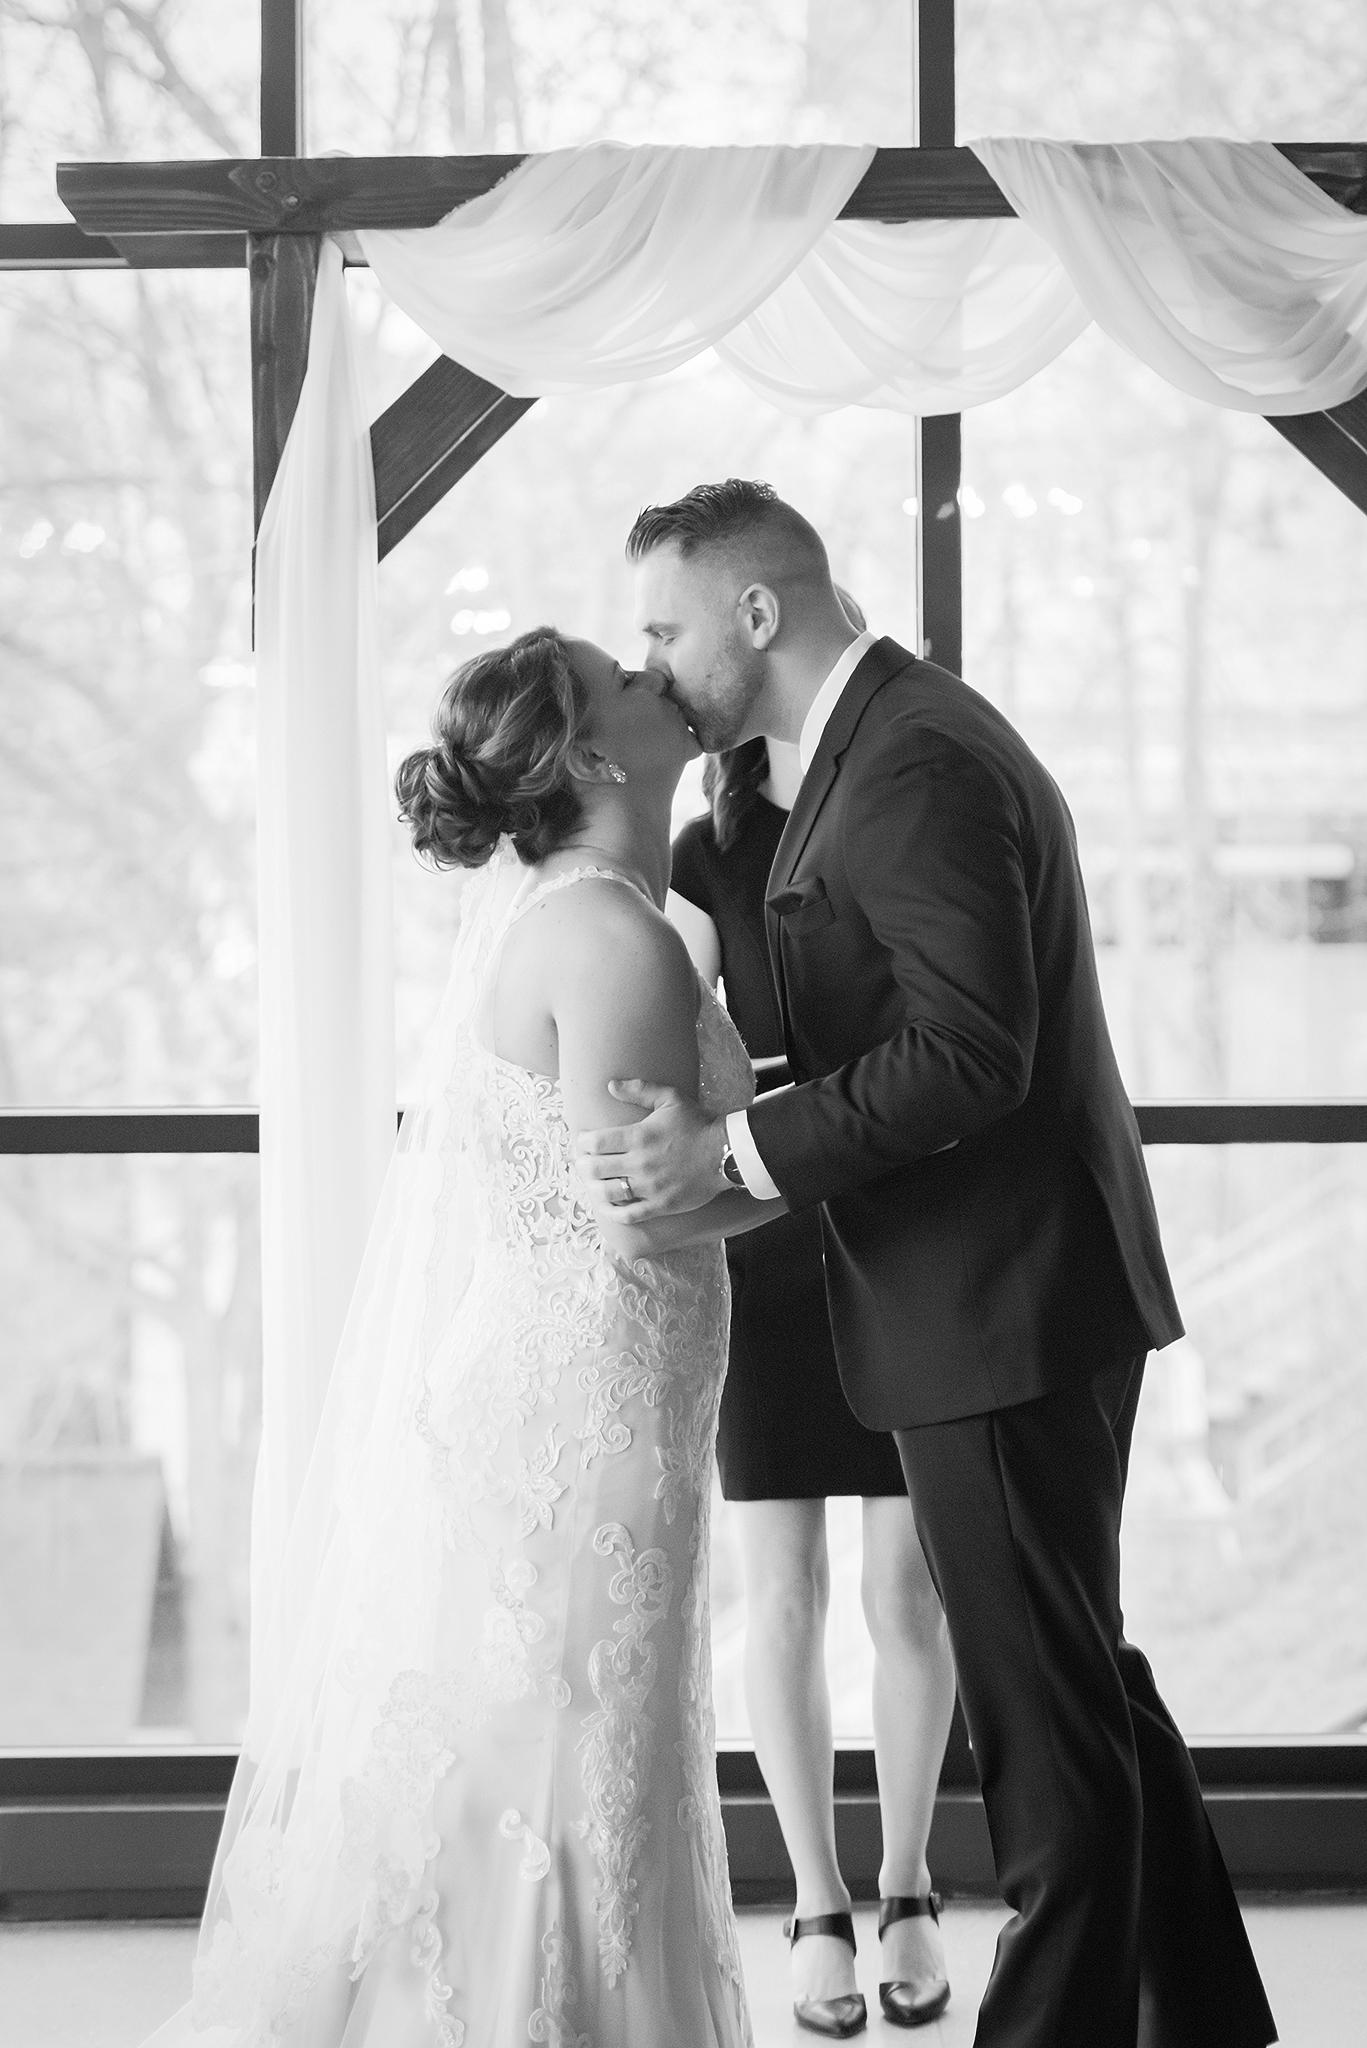 LINDSAY-ADKINS-PHOTOGRAPHY-MICHIGAN-WEDDING-PHOTOGRAPHER-FRANKENMUTH-BREWERY-WEDDING-MICHIGAN-BLOG-26